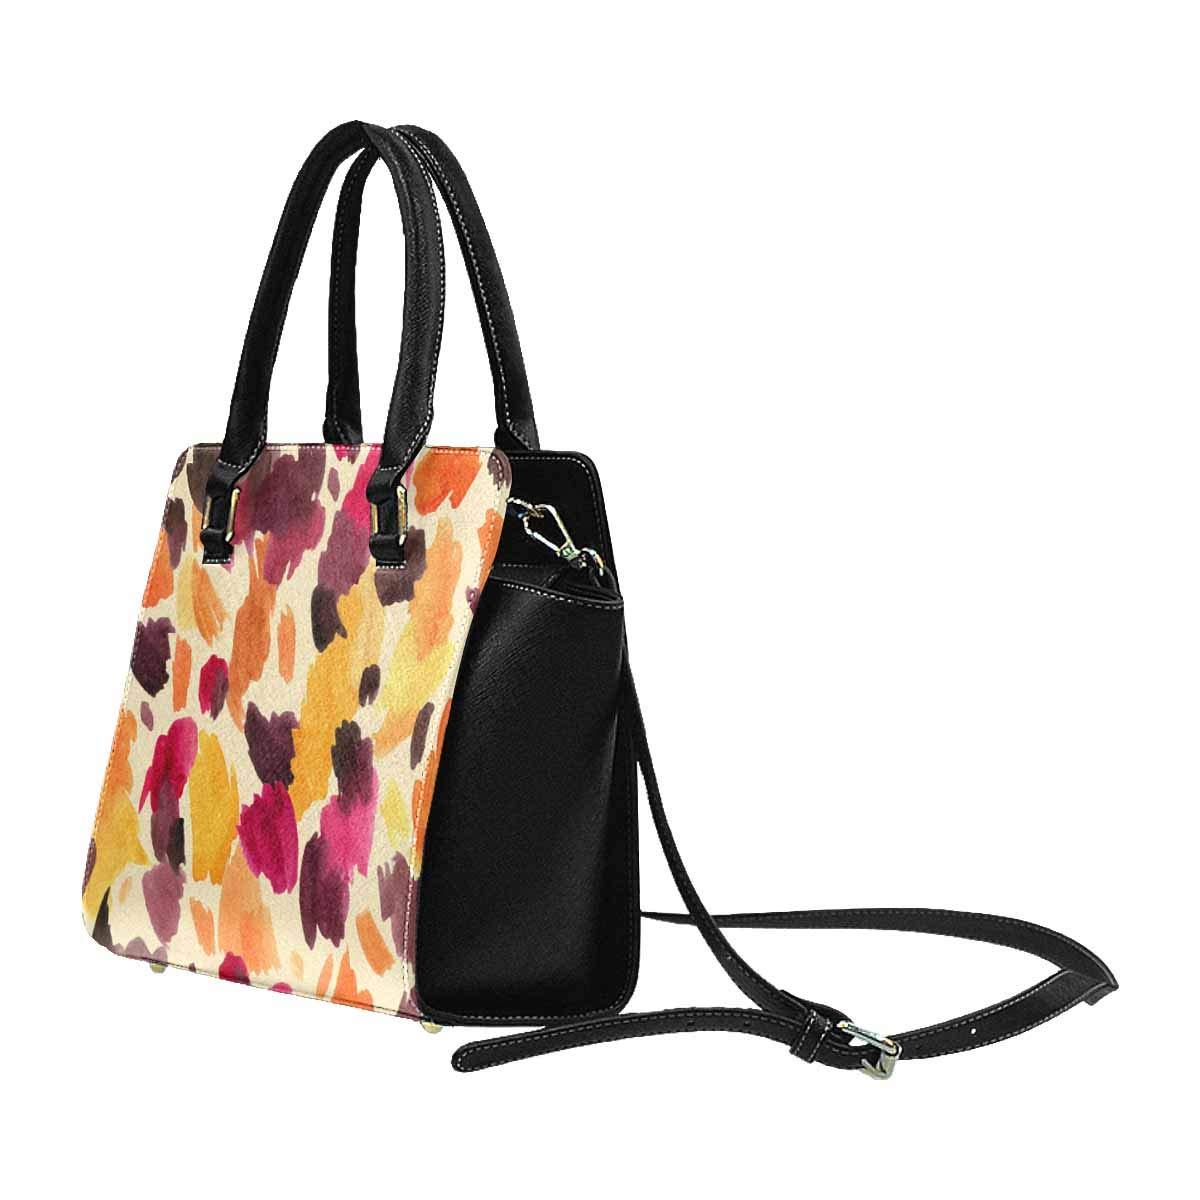 InterestPrint Womens Abstract Colorful Pattern Rivet Shoulder Handbag Shoulder Bags